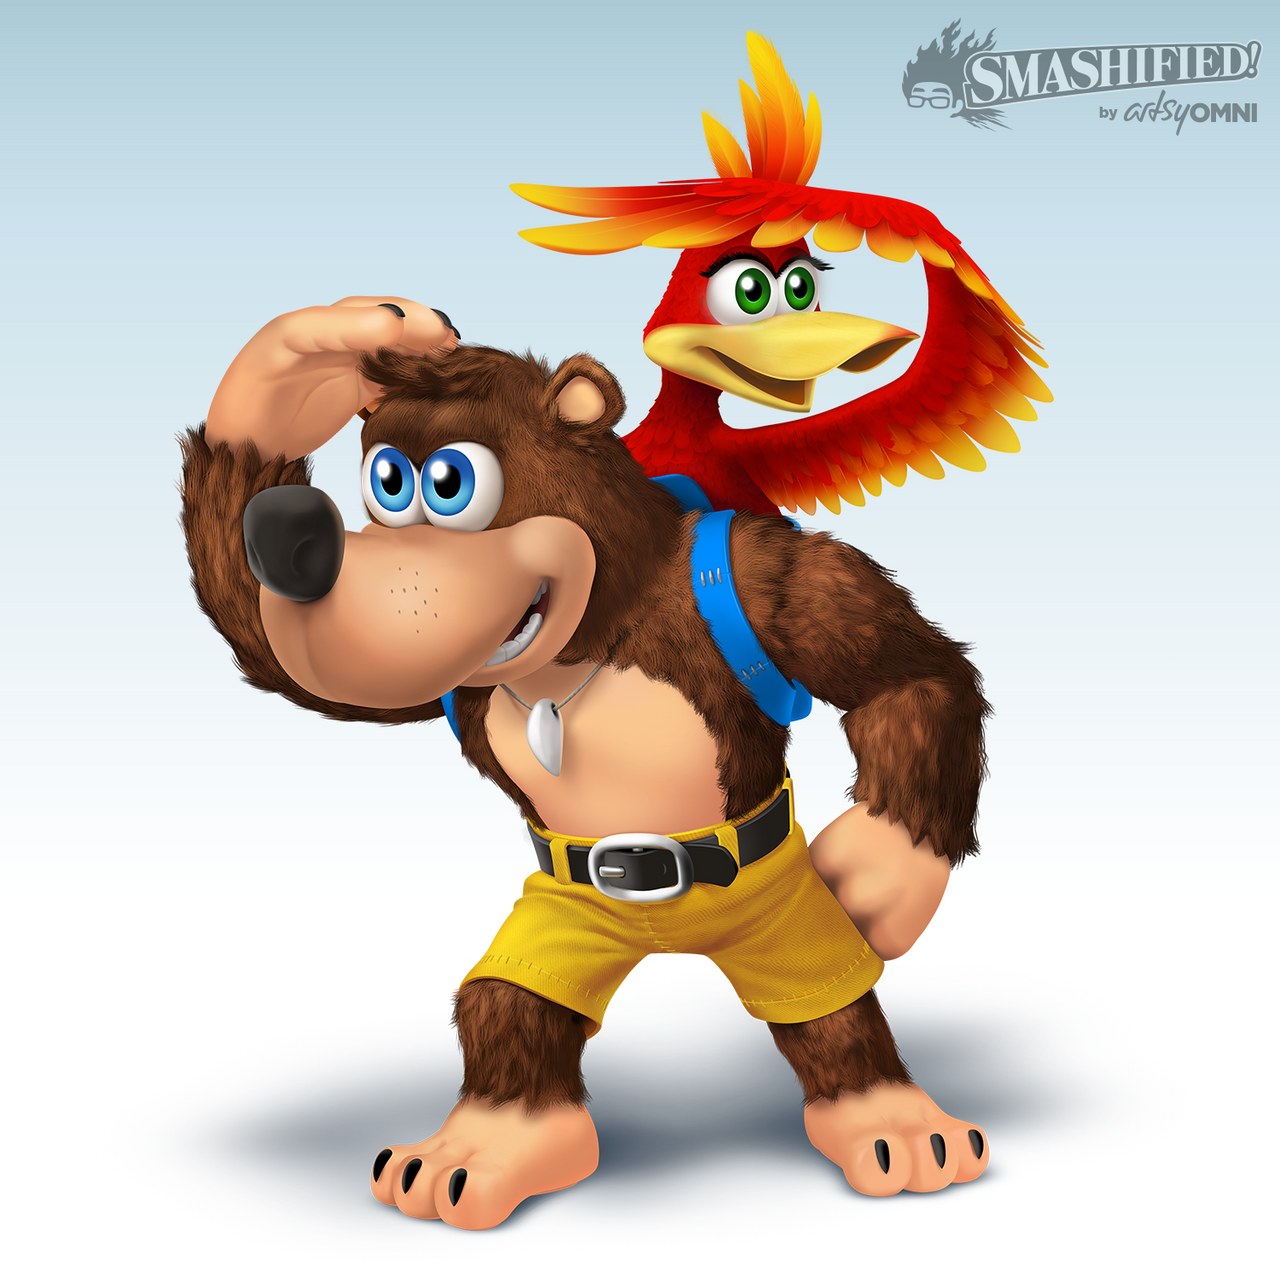 Banjo and Kazooie Smashified